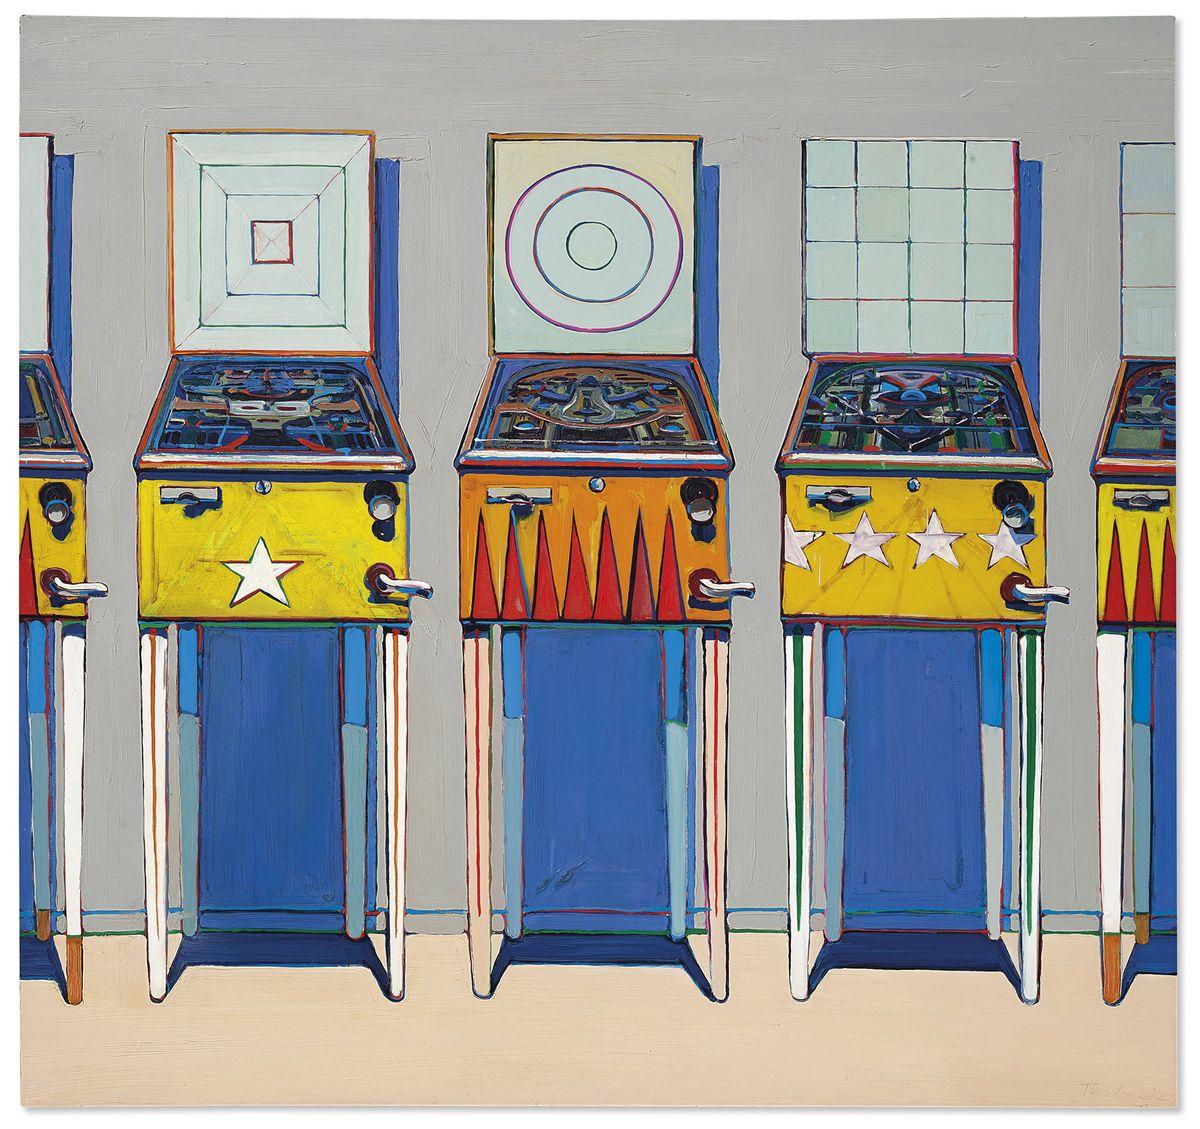 Multimillion dollar pinball painting